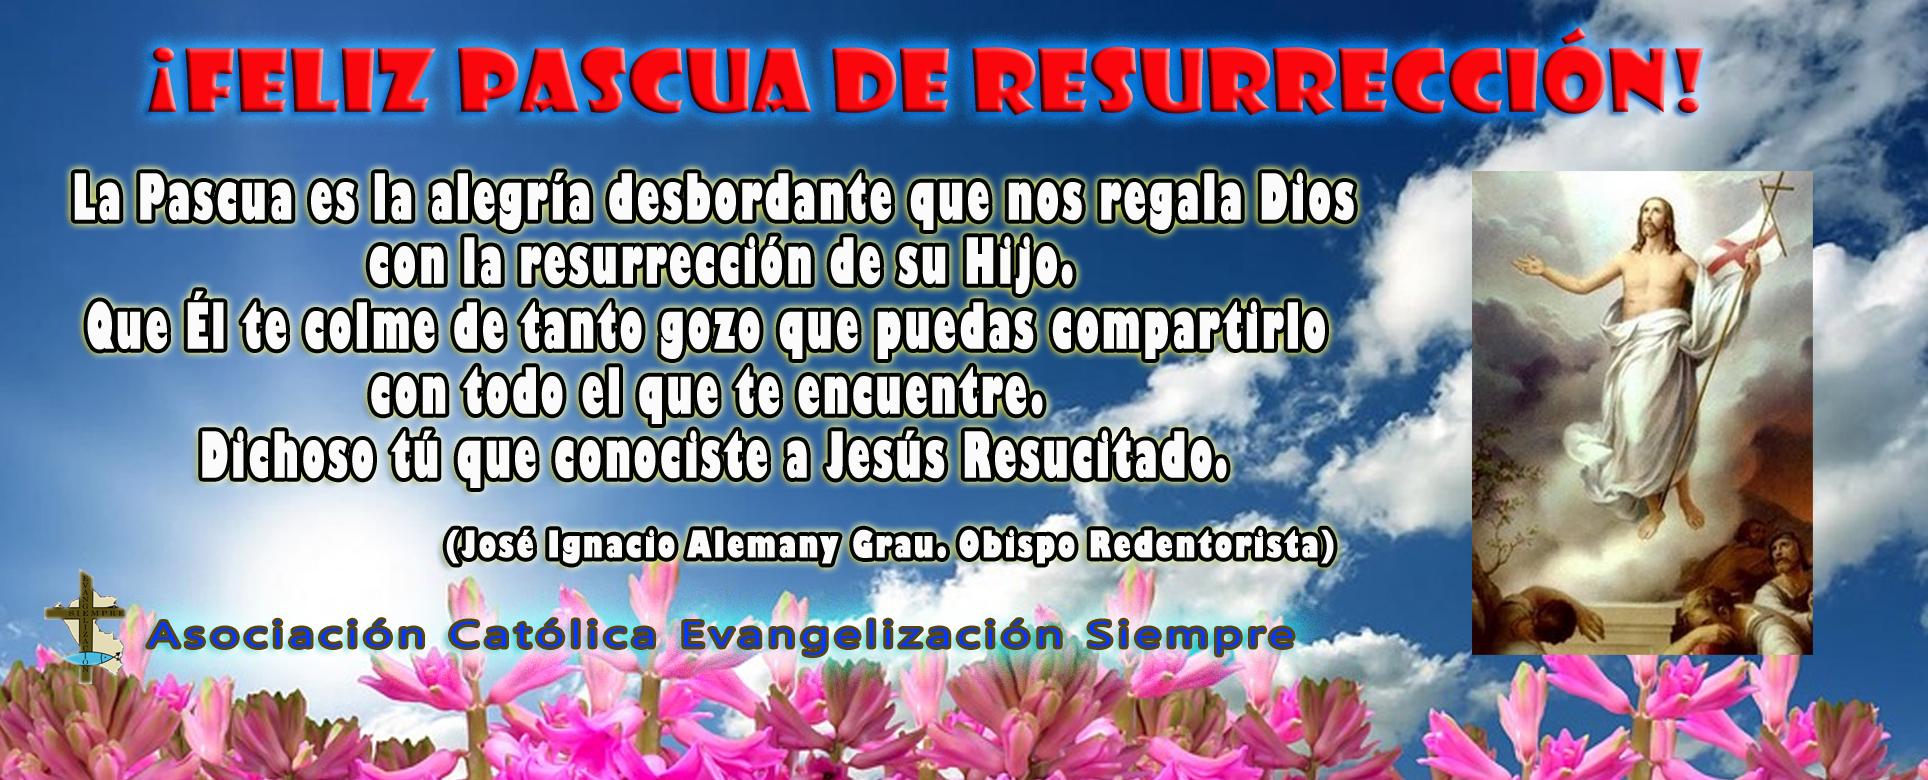 web-Feliz-Pascua-Resurrección-ok-1928x780